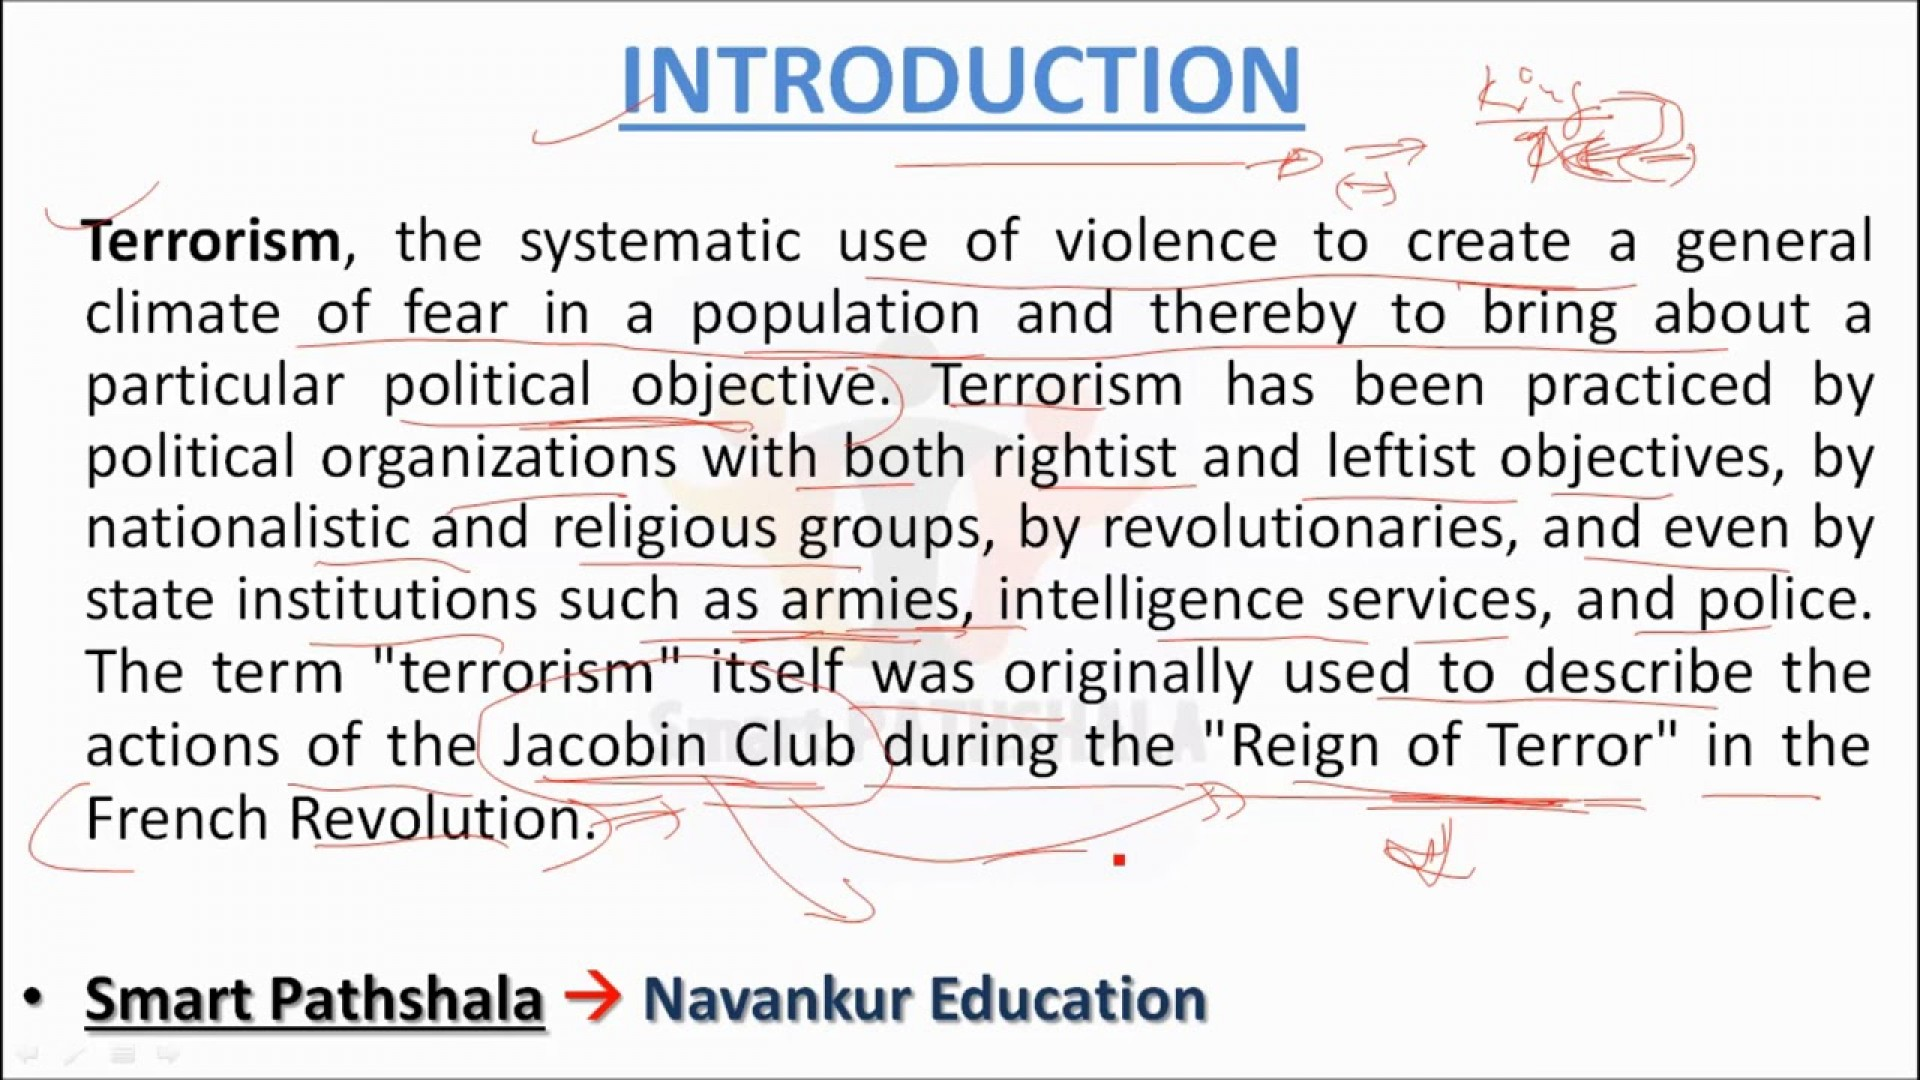 023 Terrorism Essay Maxresdefault Wonderful Domestic Conclusion Questions 1920